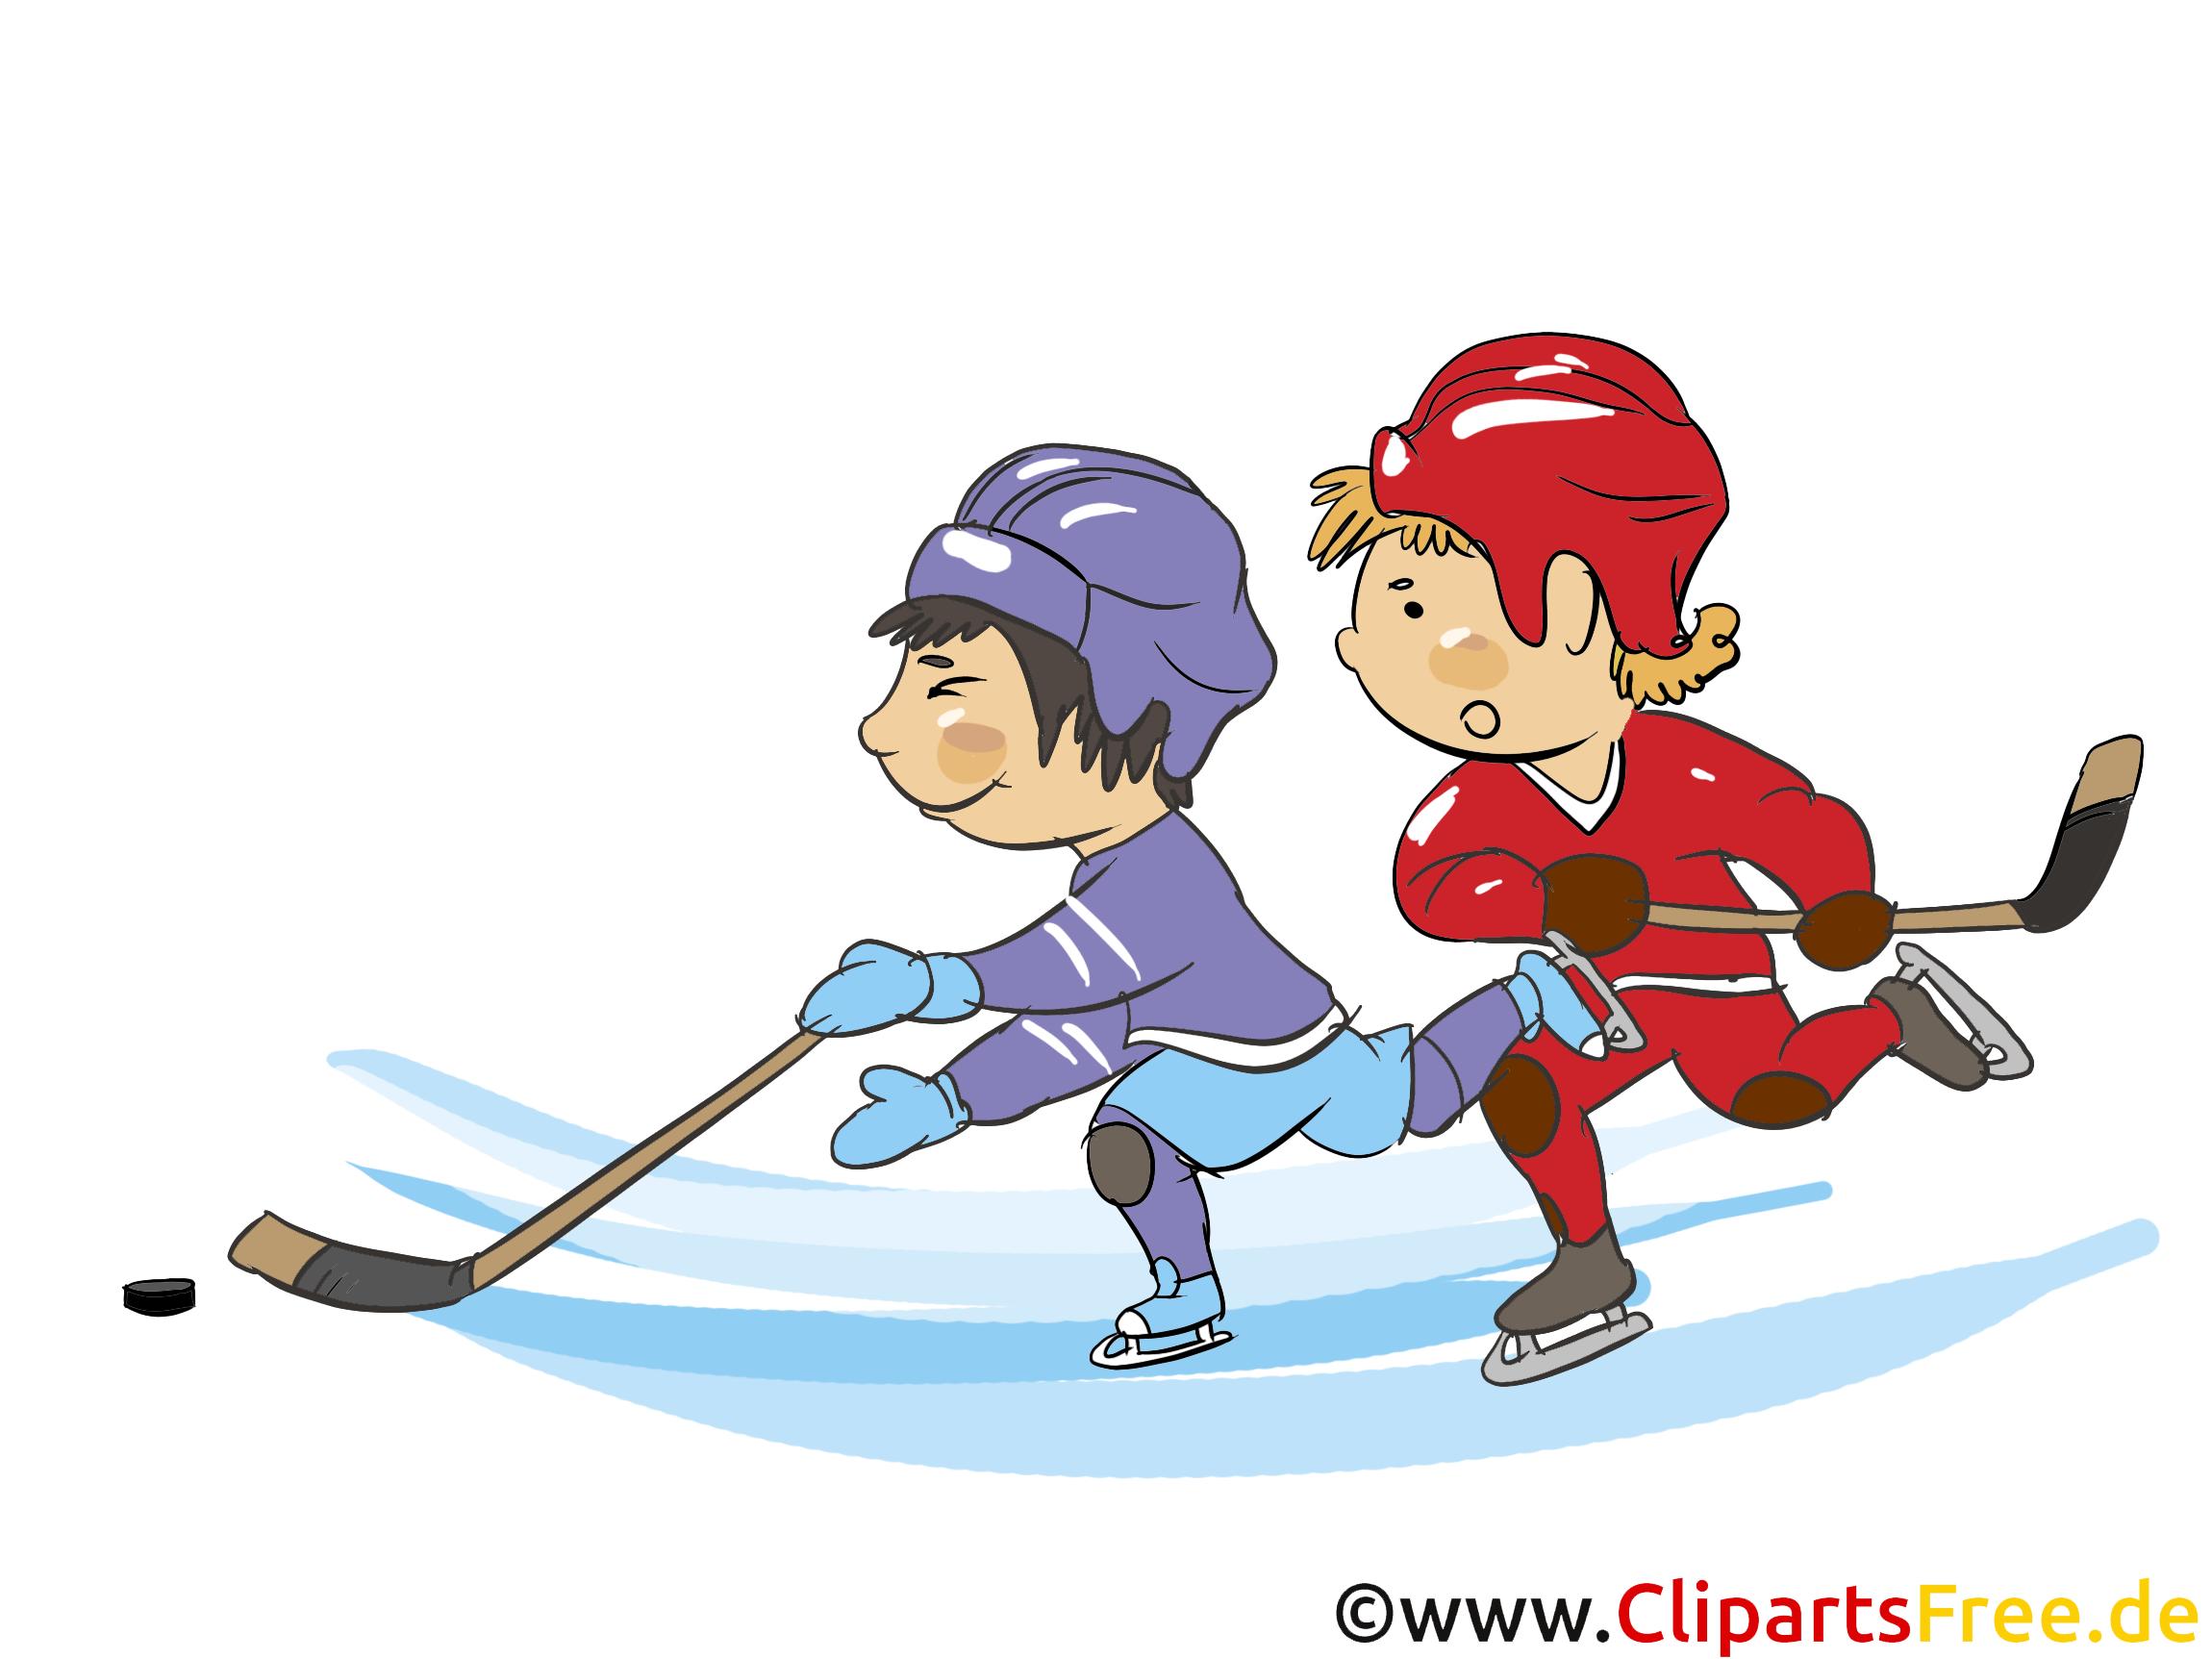 Hockey dessin gratuit t l charger hockey sur glace dessin picture image graphic clip art - Dessin hockey sur glace ...